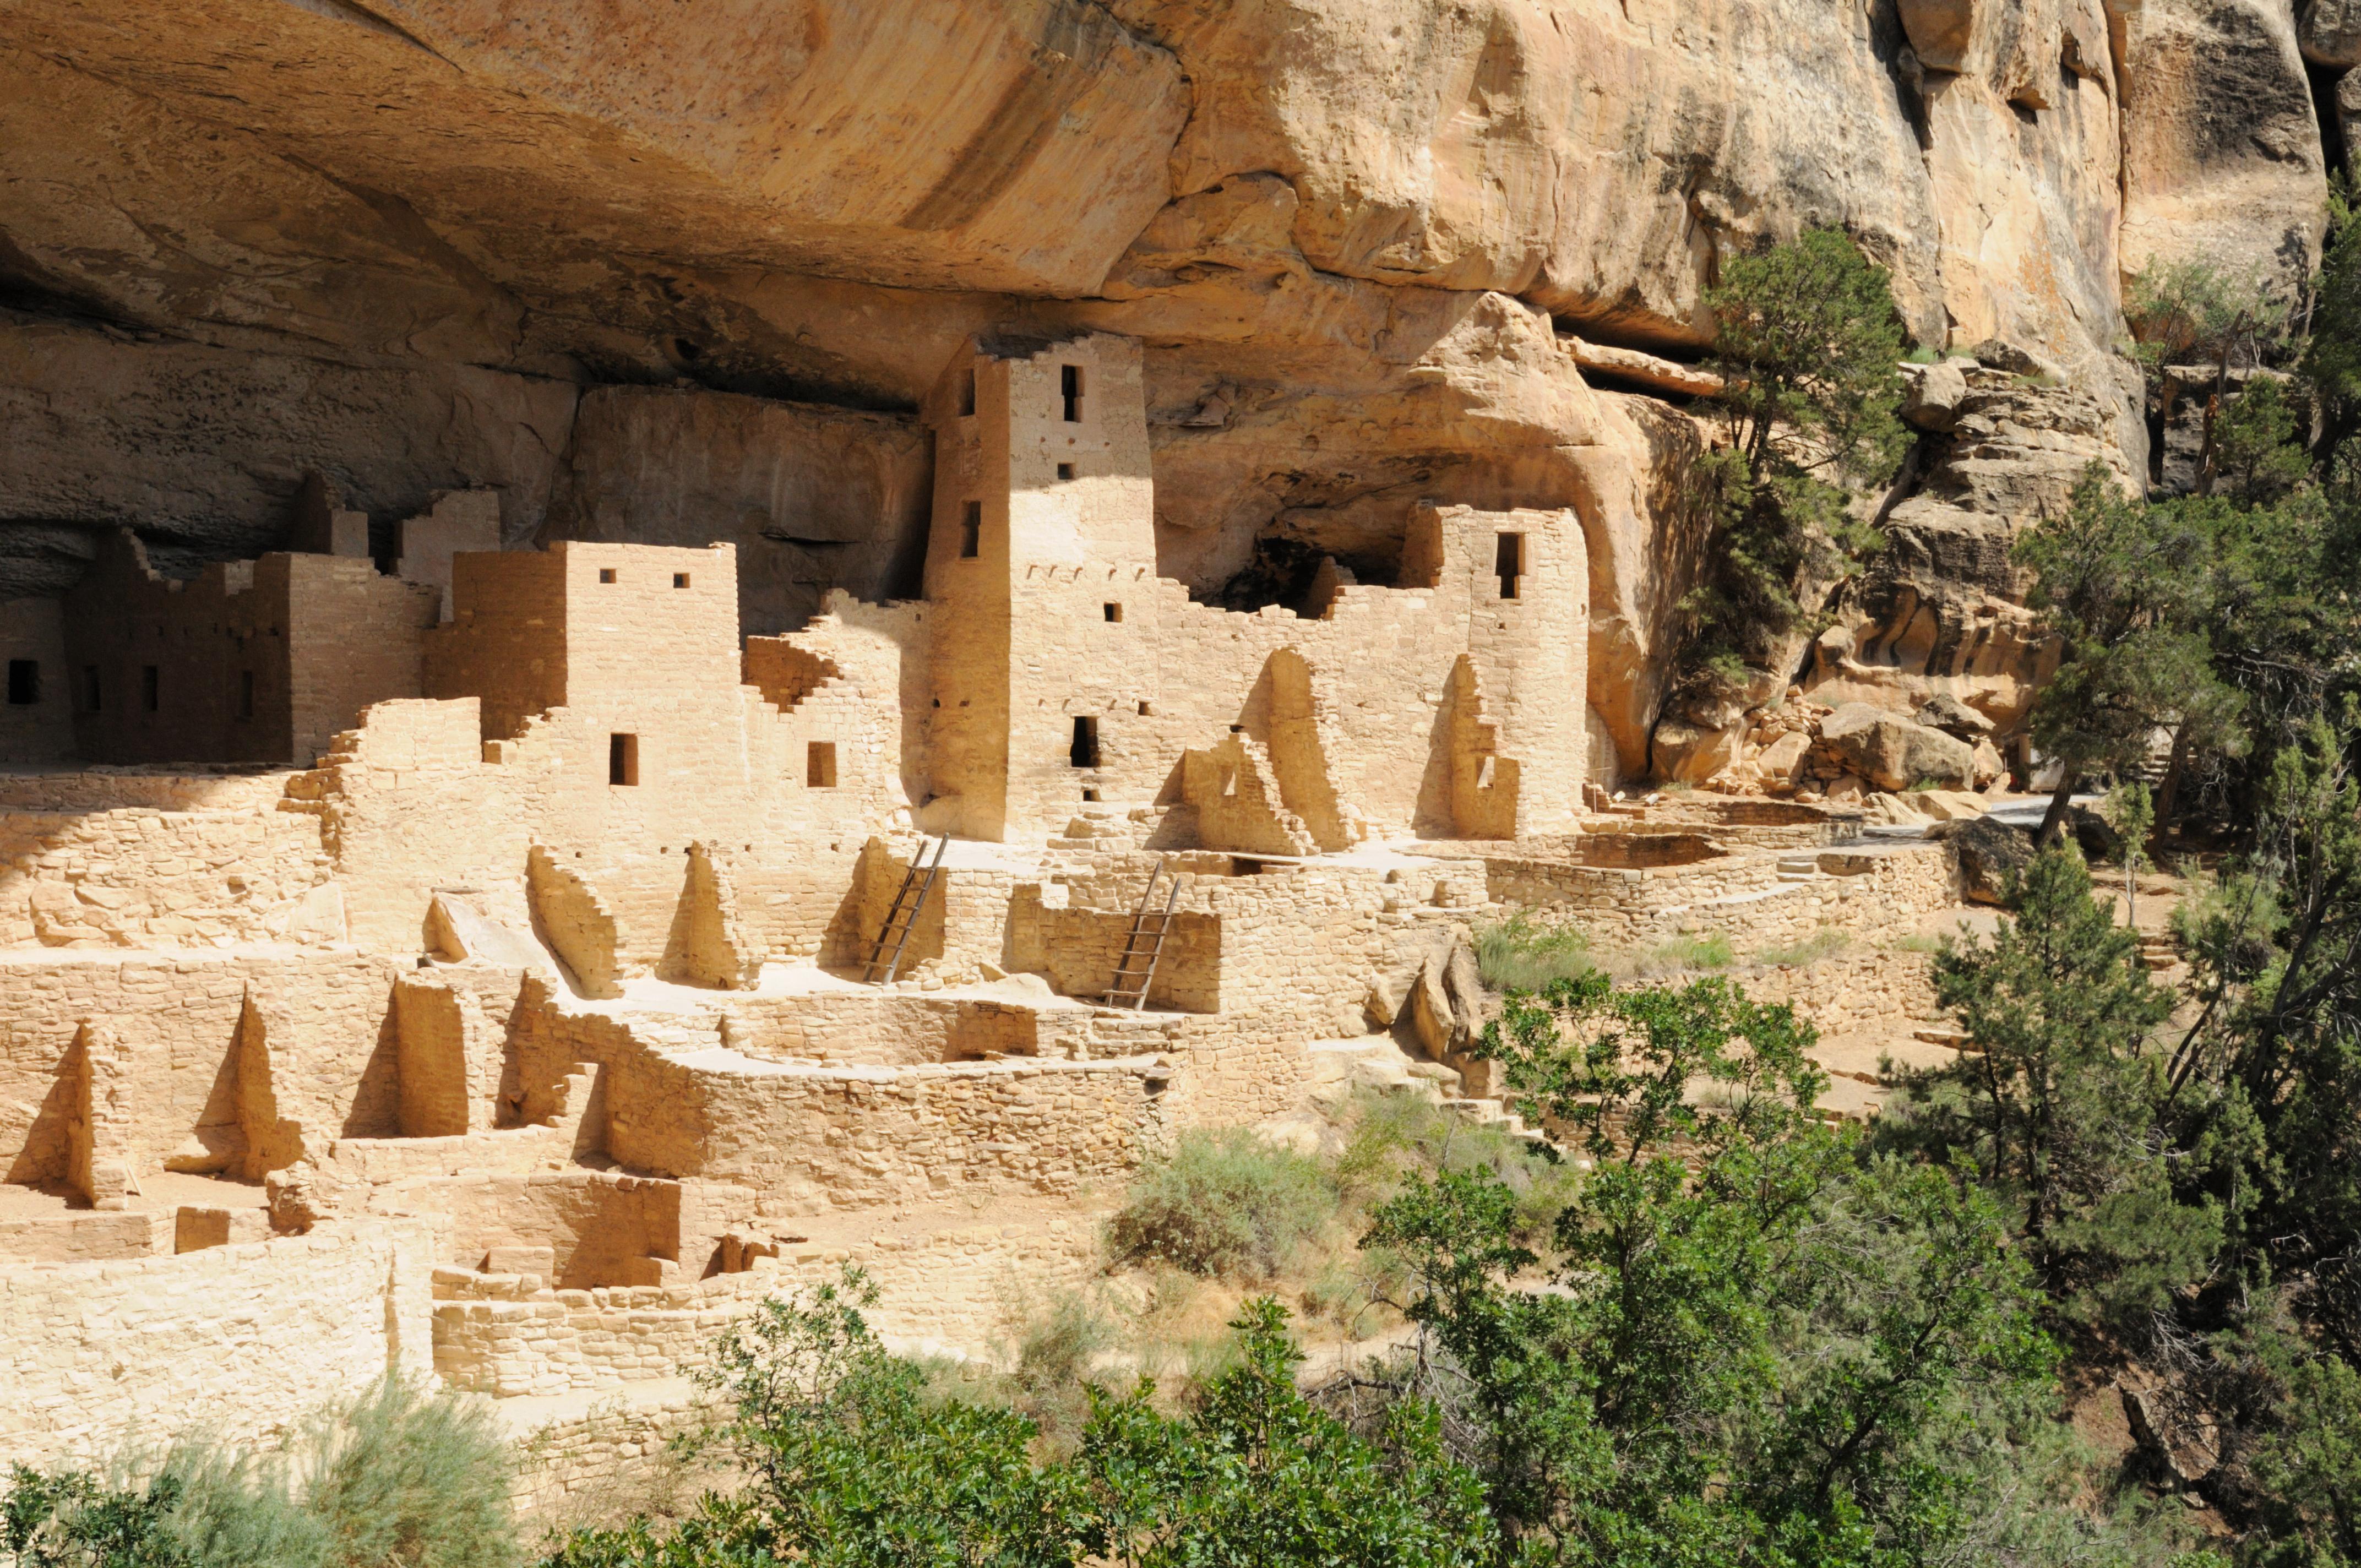 Pueblo people | The USA: Landscapes and Urban Spaces  |Cahokia Indians Mesa Verde